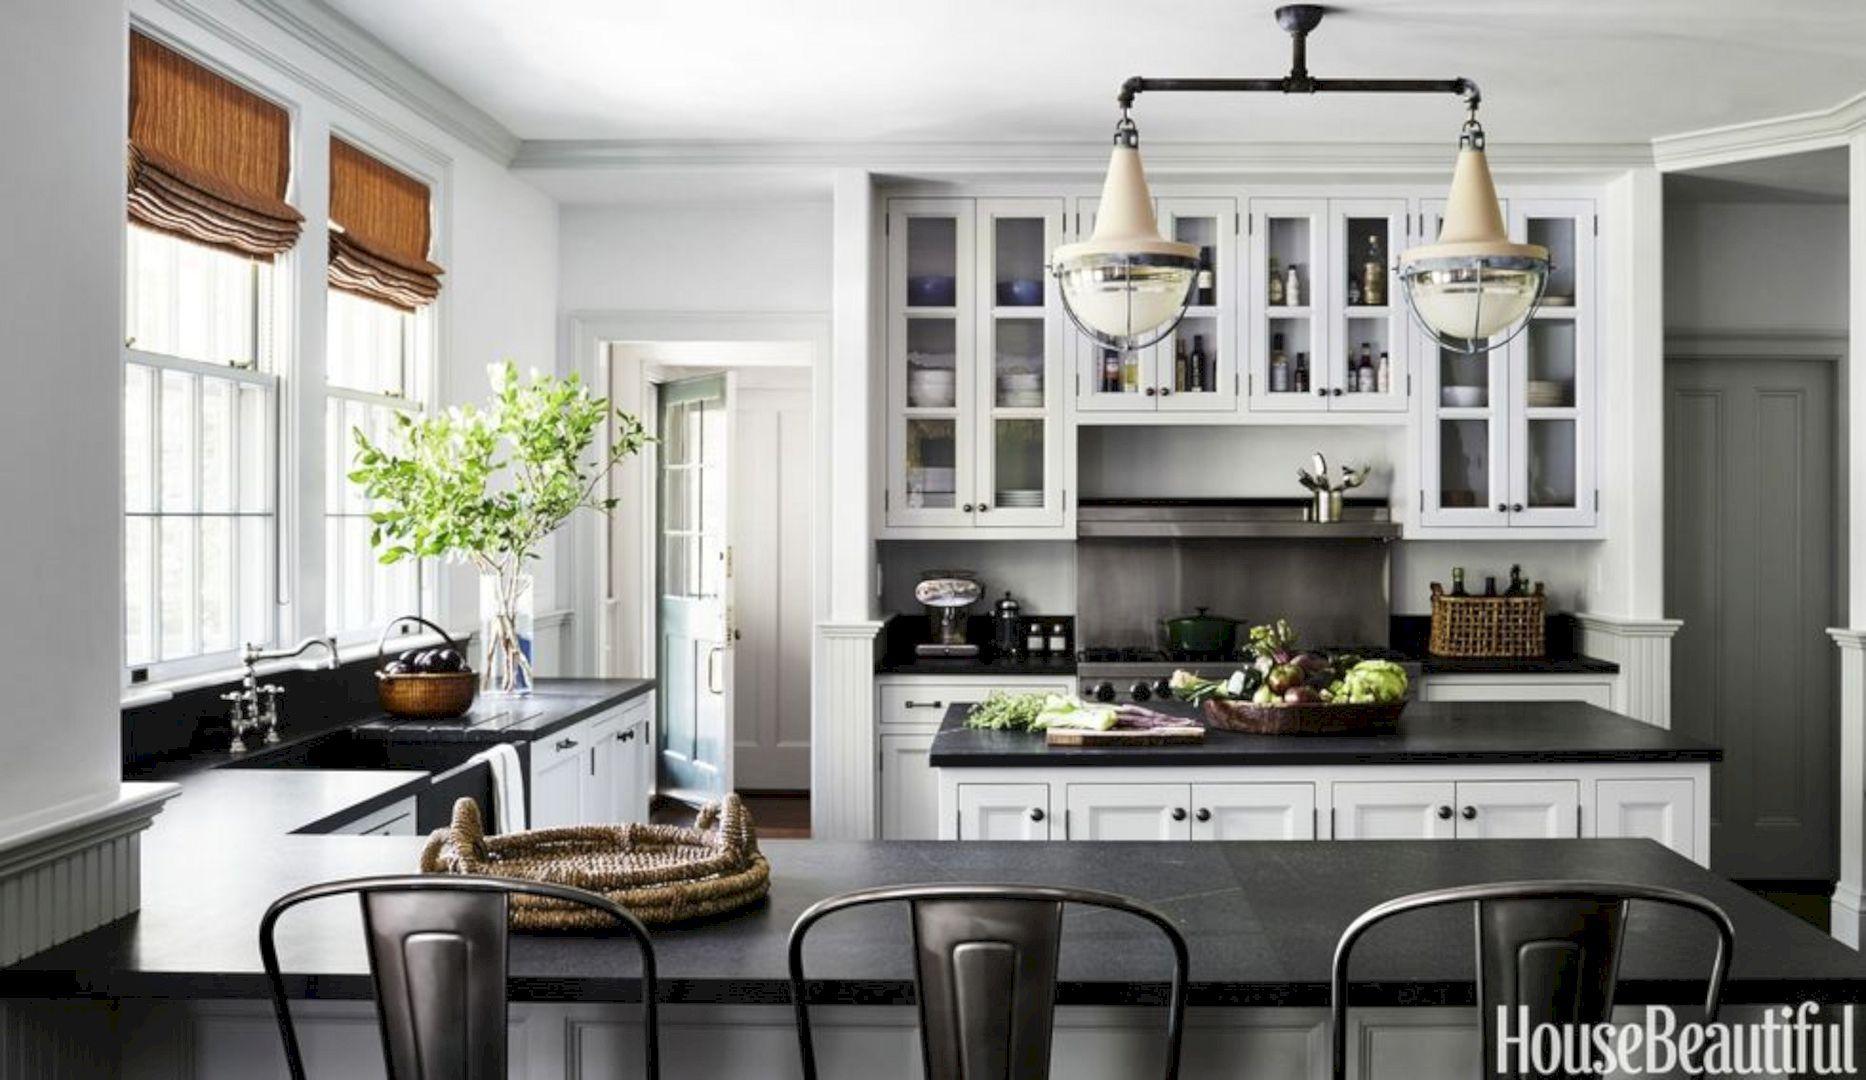 16 Impressive Kitchen Interior Designs httpswwwdesignlisticlecom kitchen interior designs